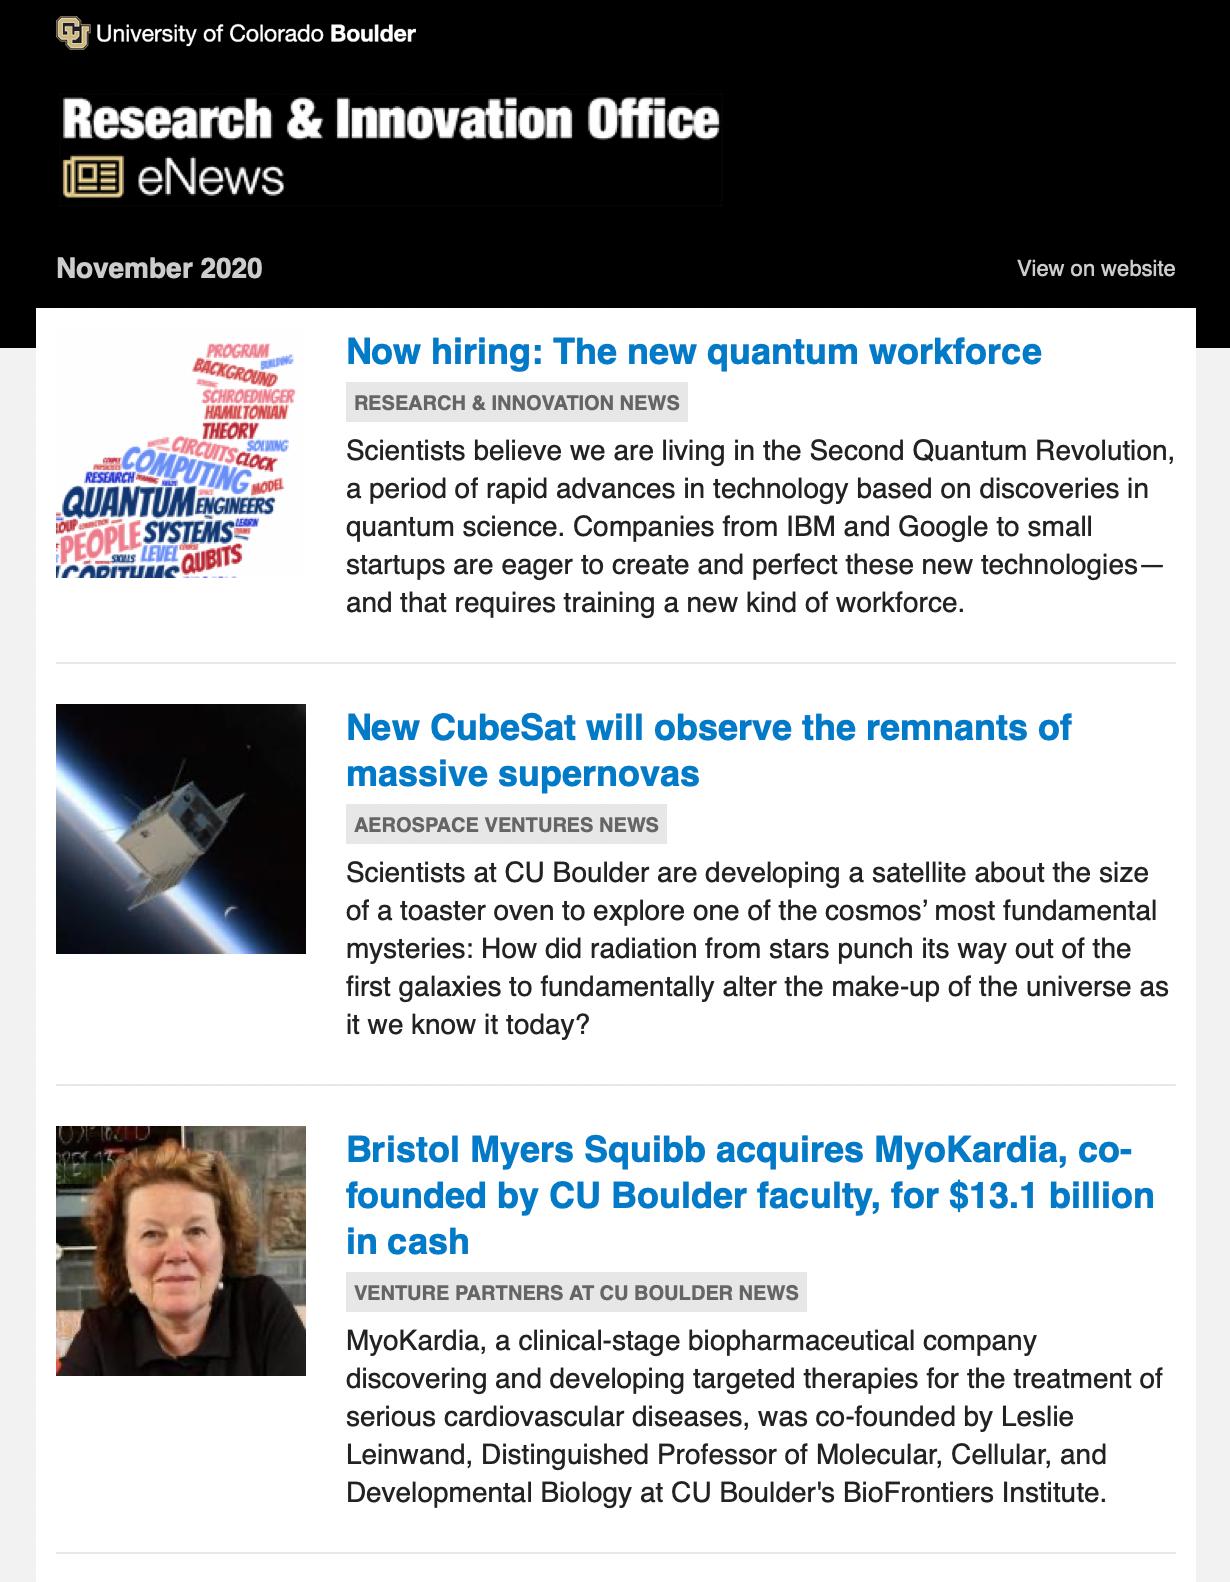 eNews example (screenshot)